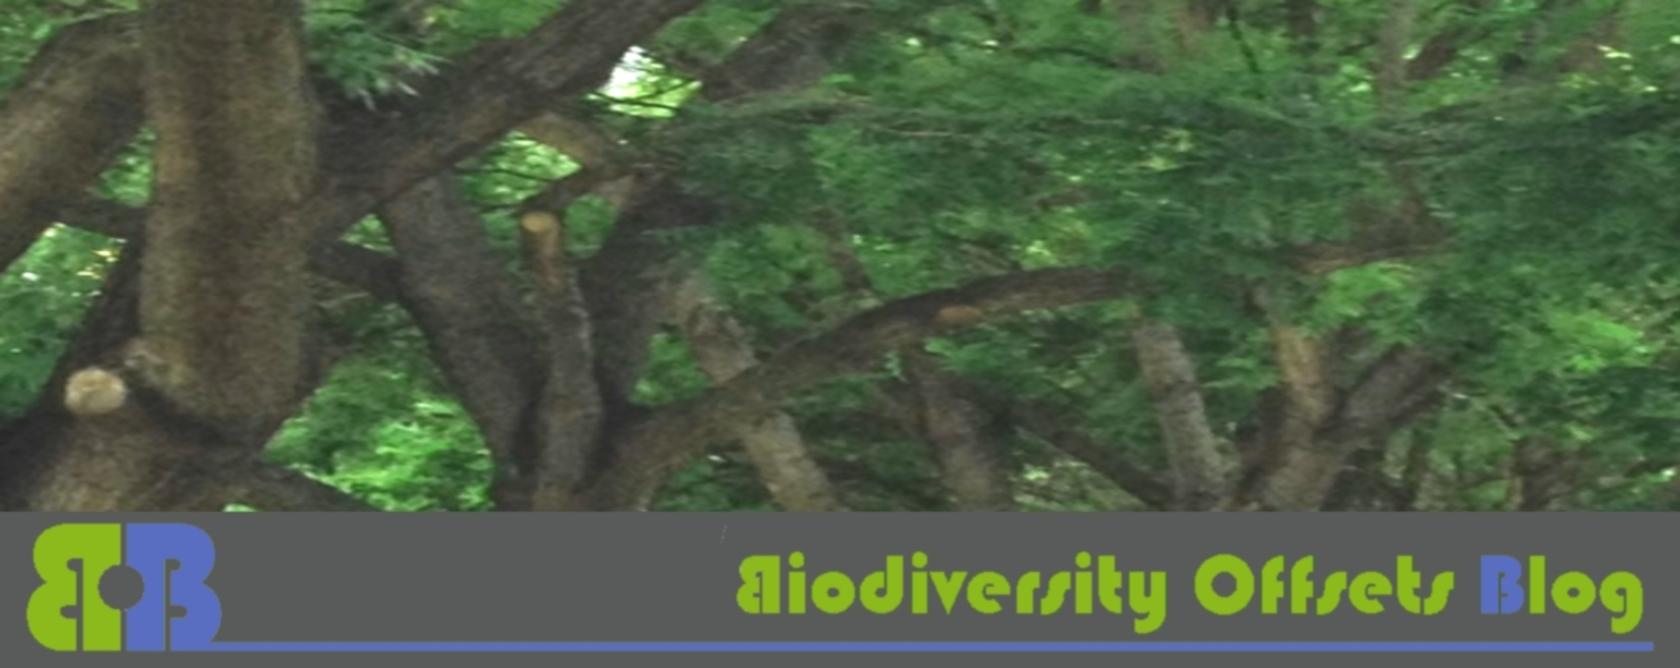 Biodiversity Offsets Blog Logo_hellgruen_Bäume_1680